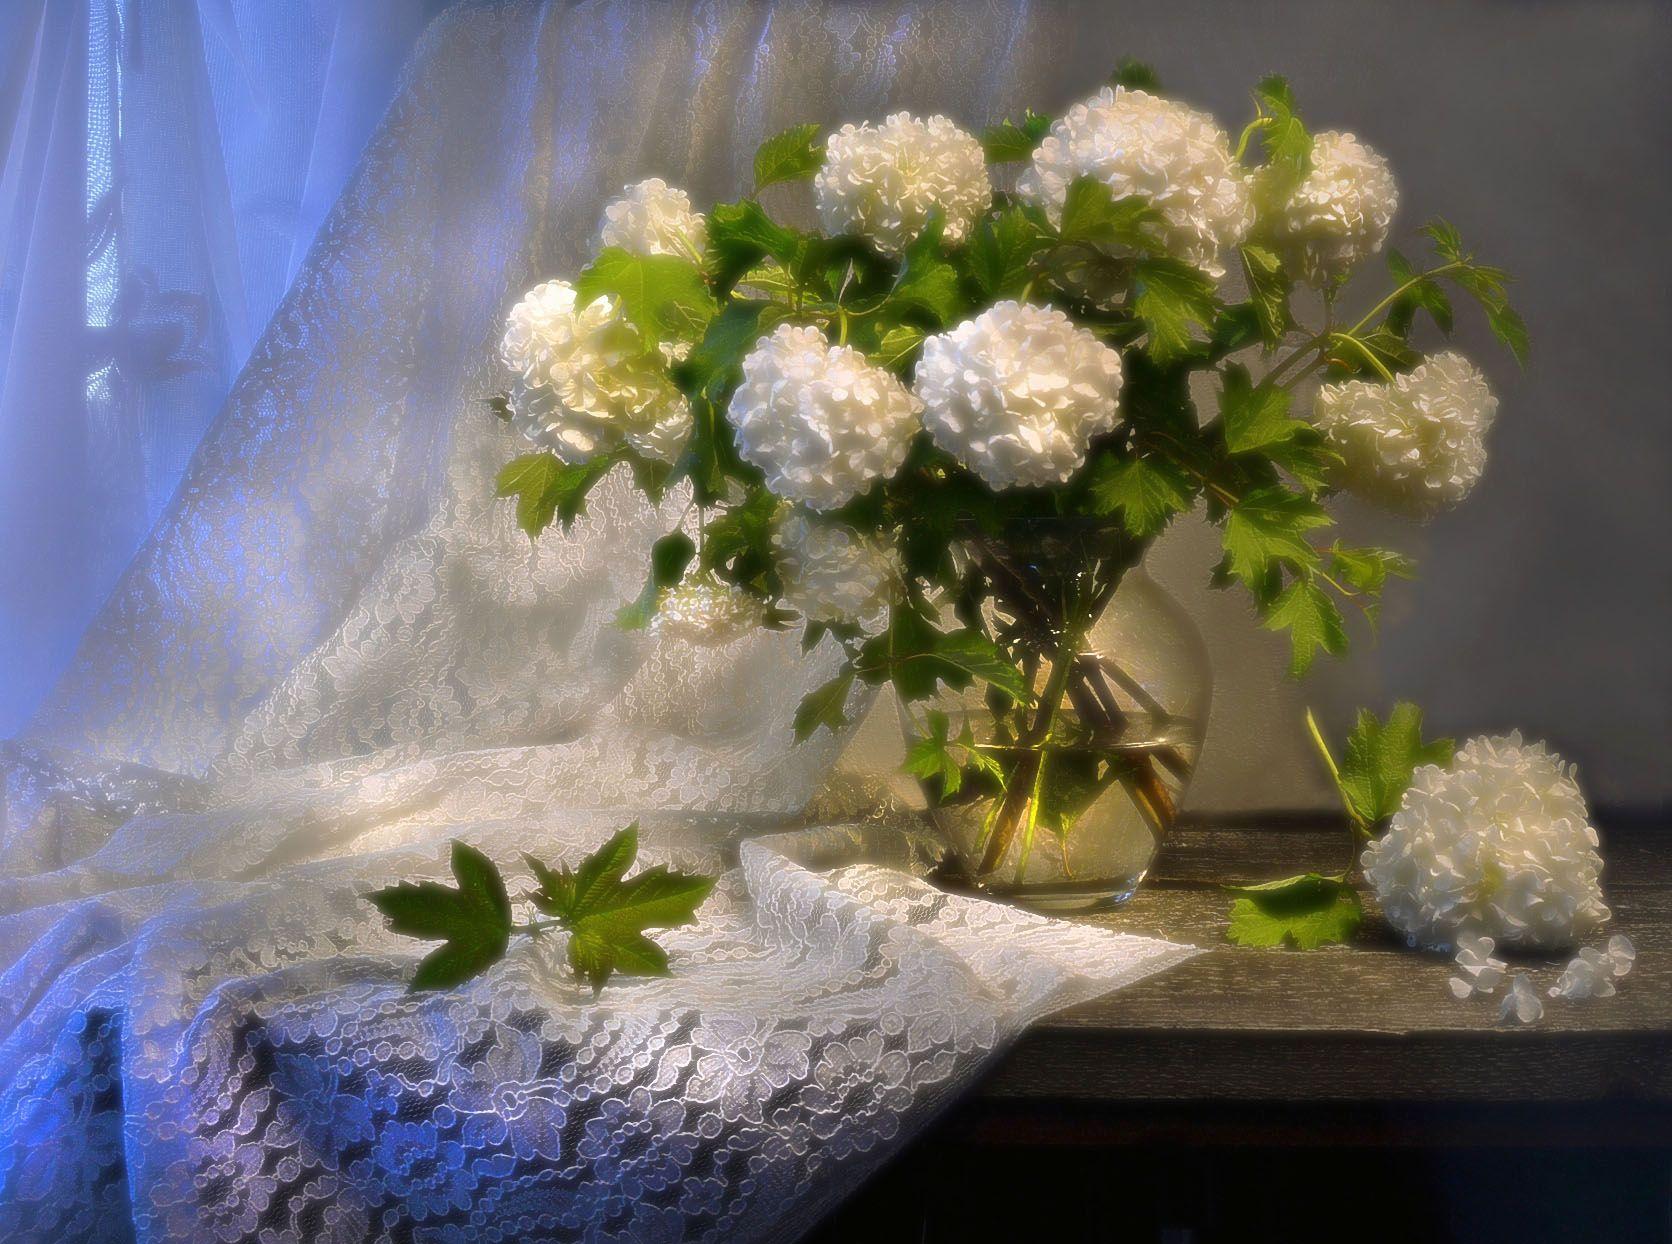 still life, натюрморт, белая ночь, июнь, калина, летний вечер, лето, лунный свет, натюрморт, цветы, Колова Валентина